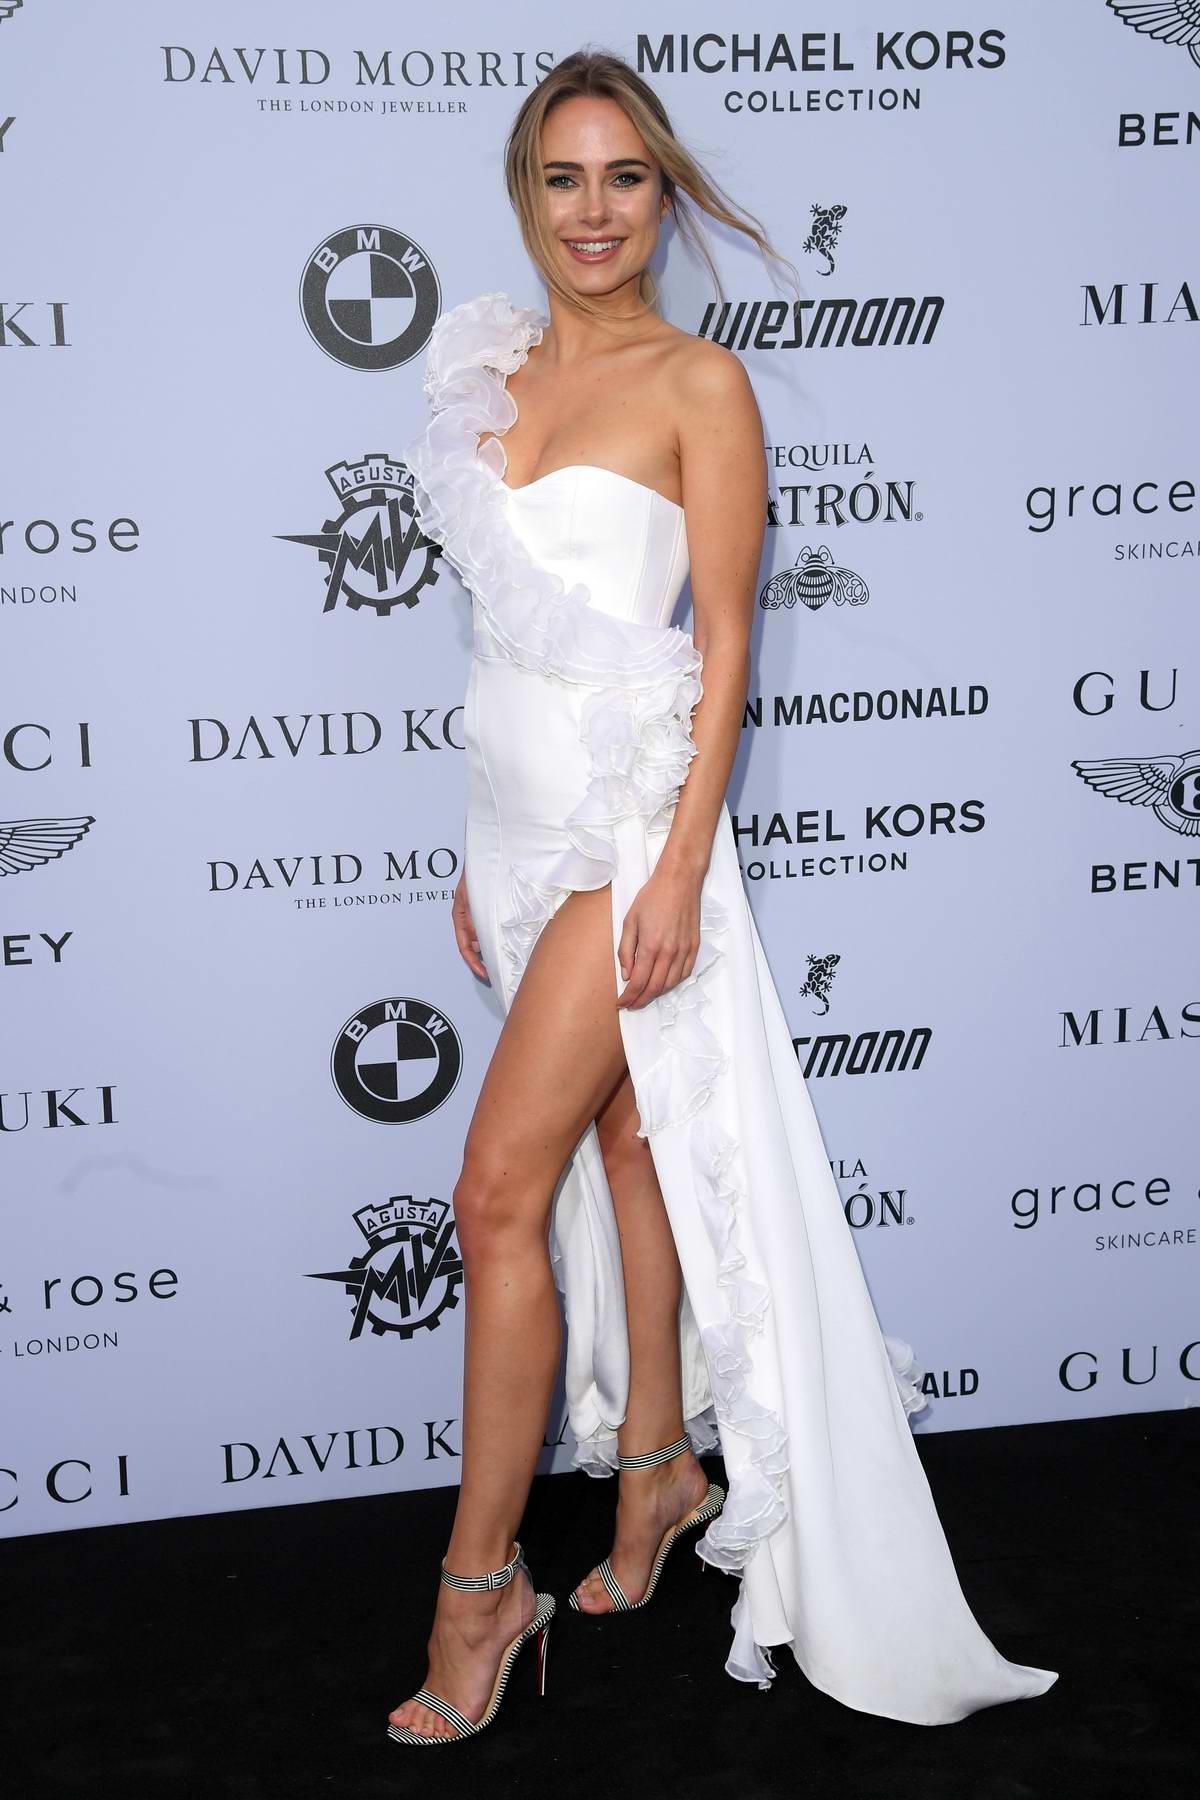 Kimberley Garner attends the Cash & Rocket Masquerade Ball & Auction Gala in London, UK